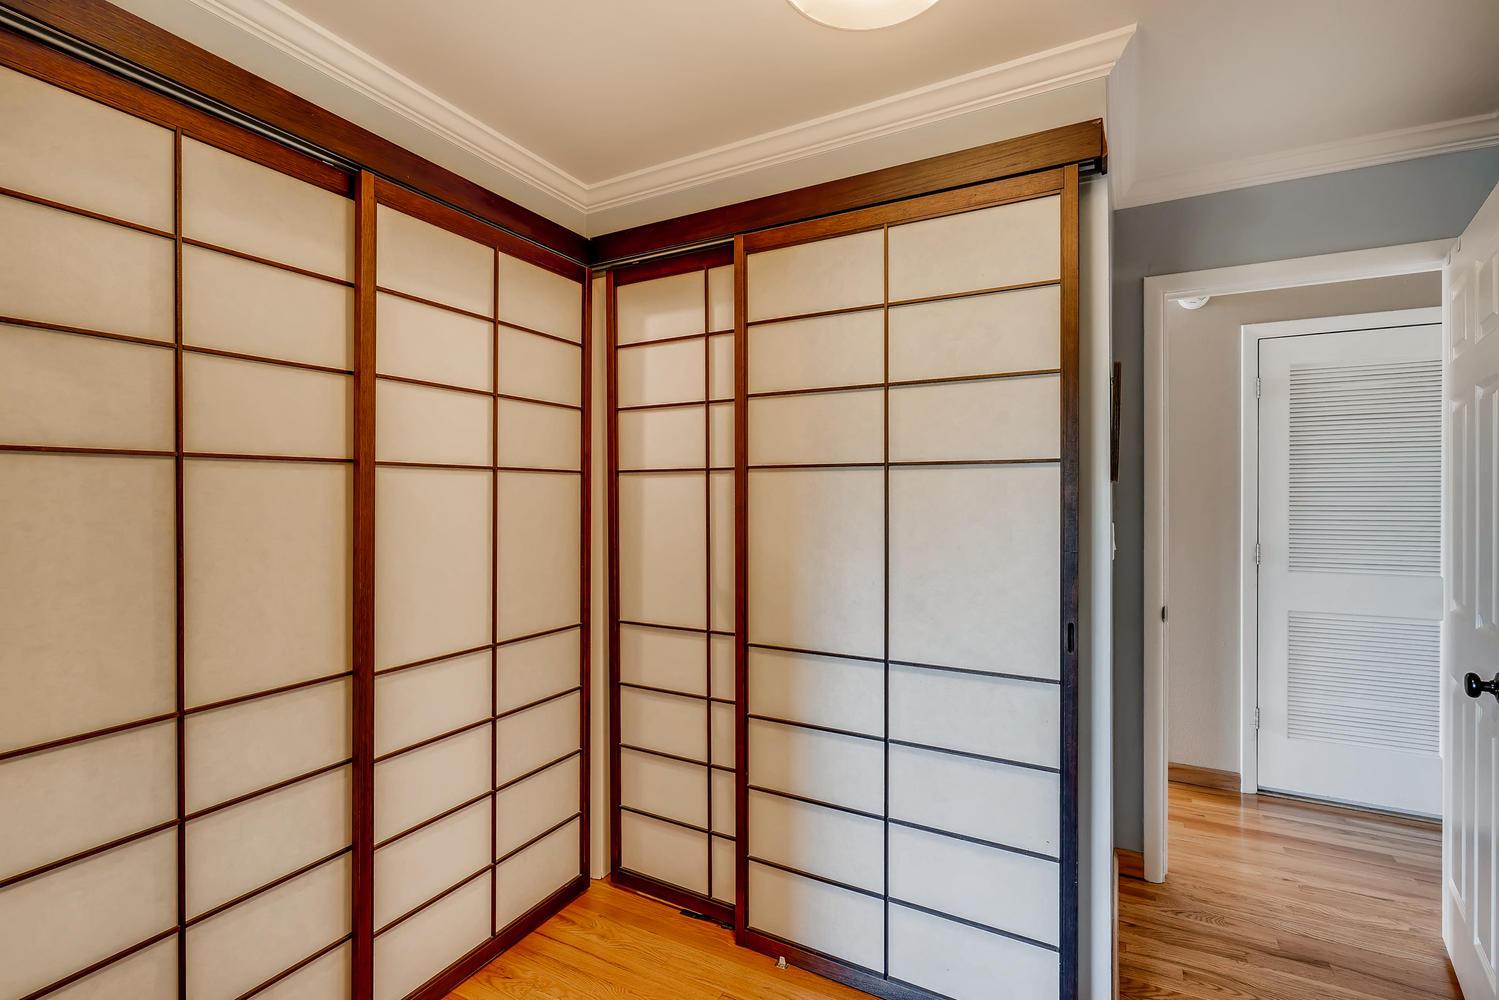 22046 Panorama Dr Golden CO-large-018-39-Master Bedroom Closet-1499x1000-72dpi.jpg